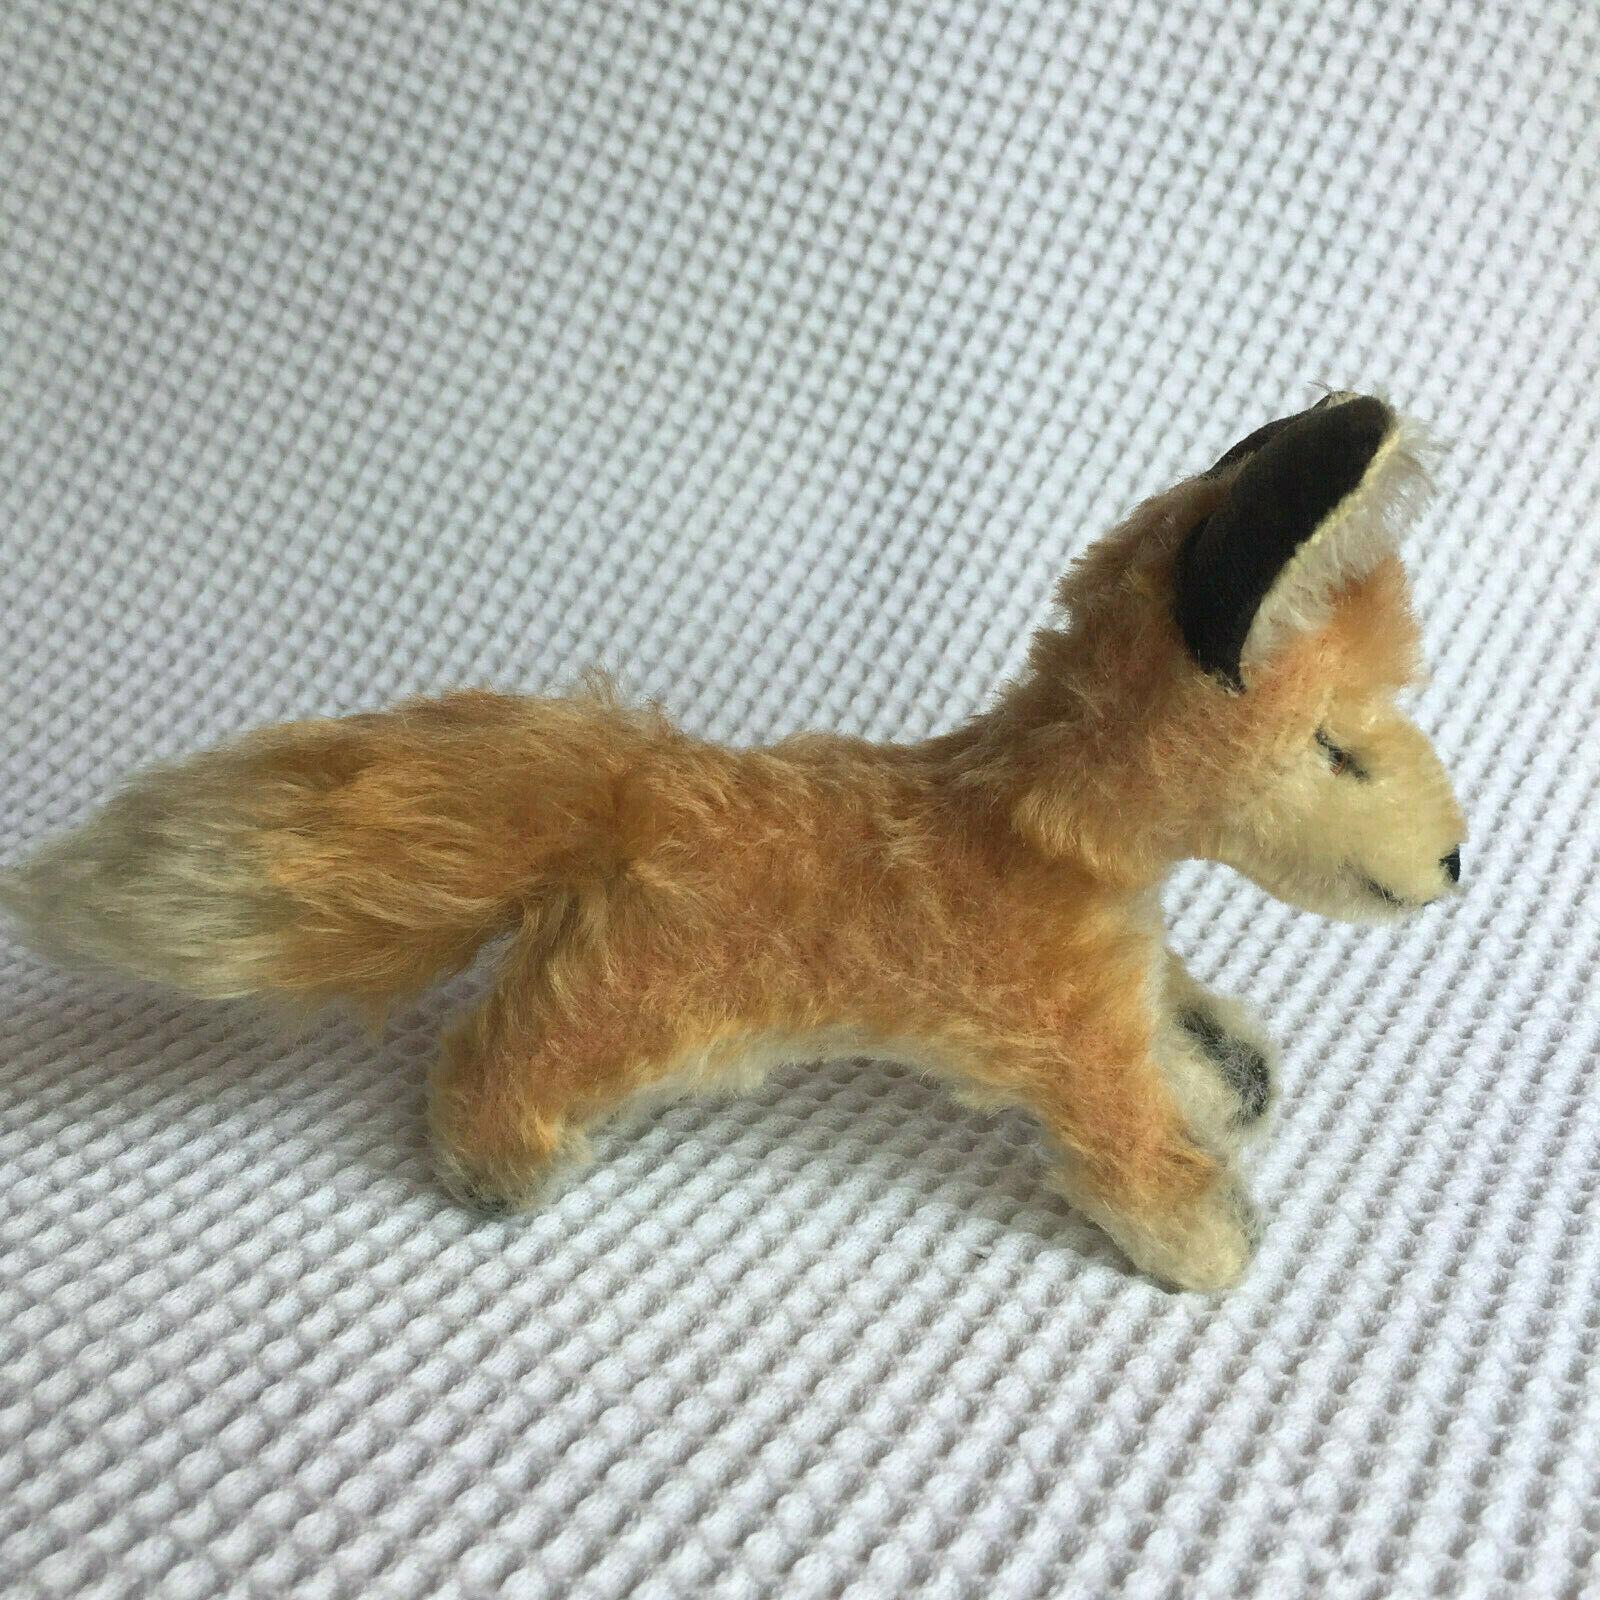 VINTAGE  STEIFF DESERT FOX XORRY MOHAIR HARD STUFFED TOY 1950s BUTTON 10cm HIGH